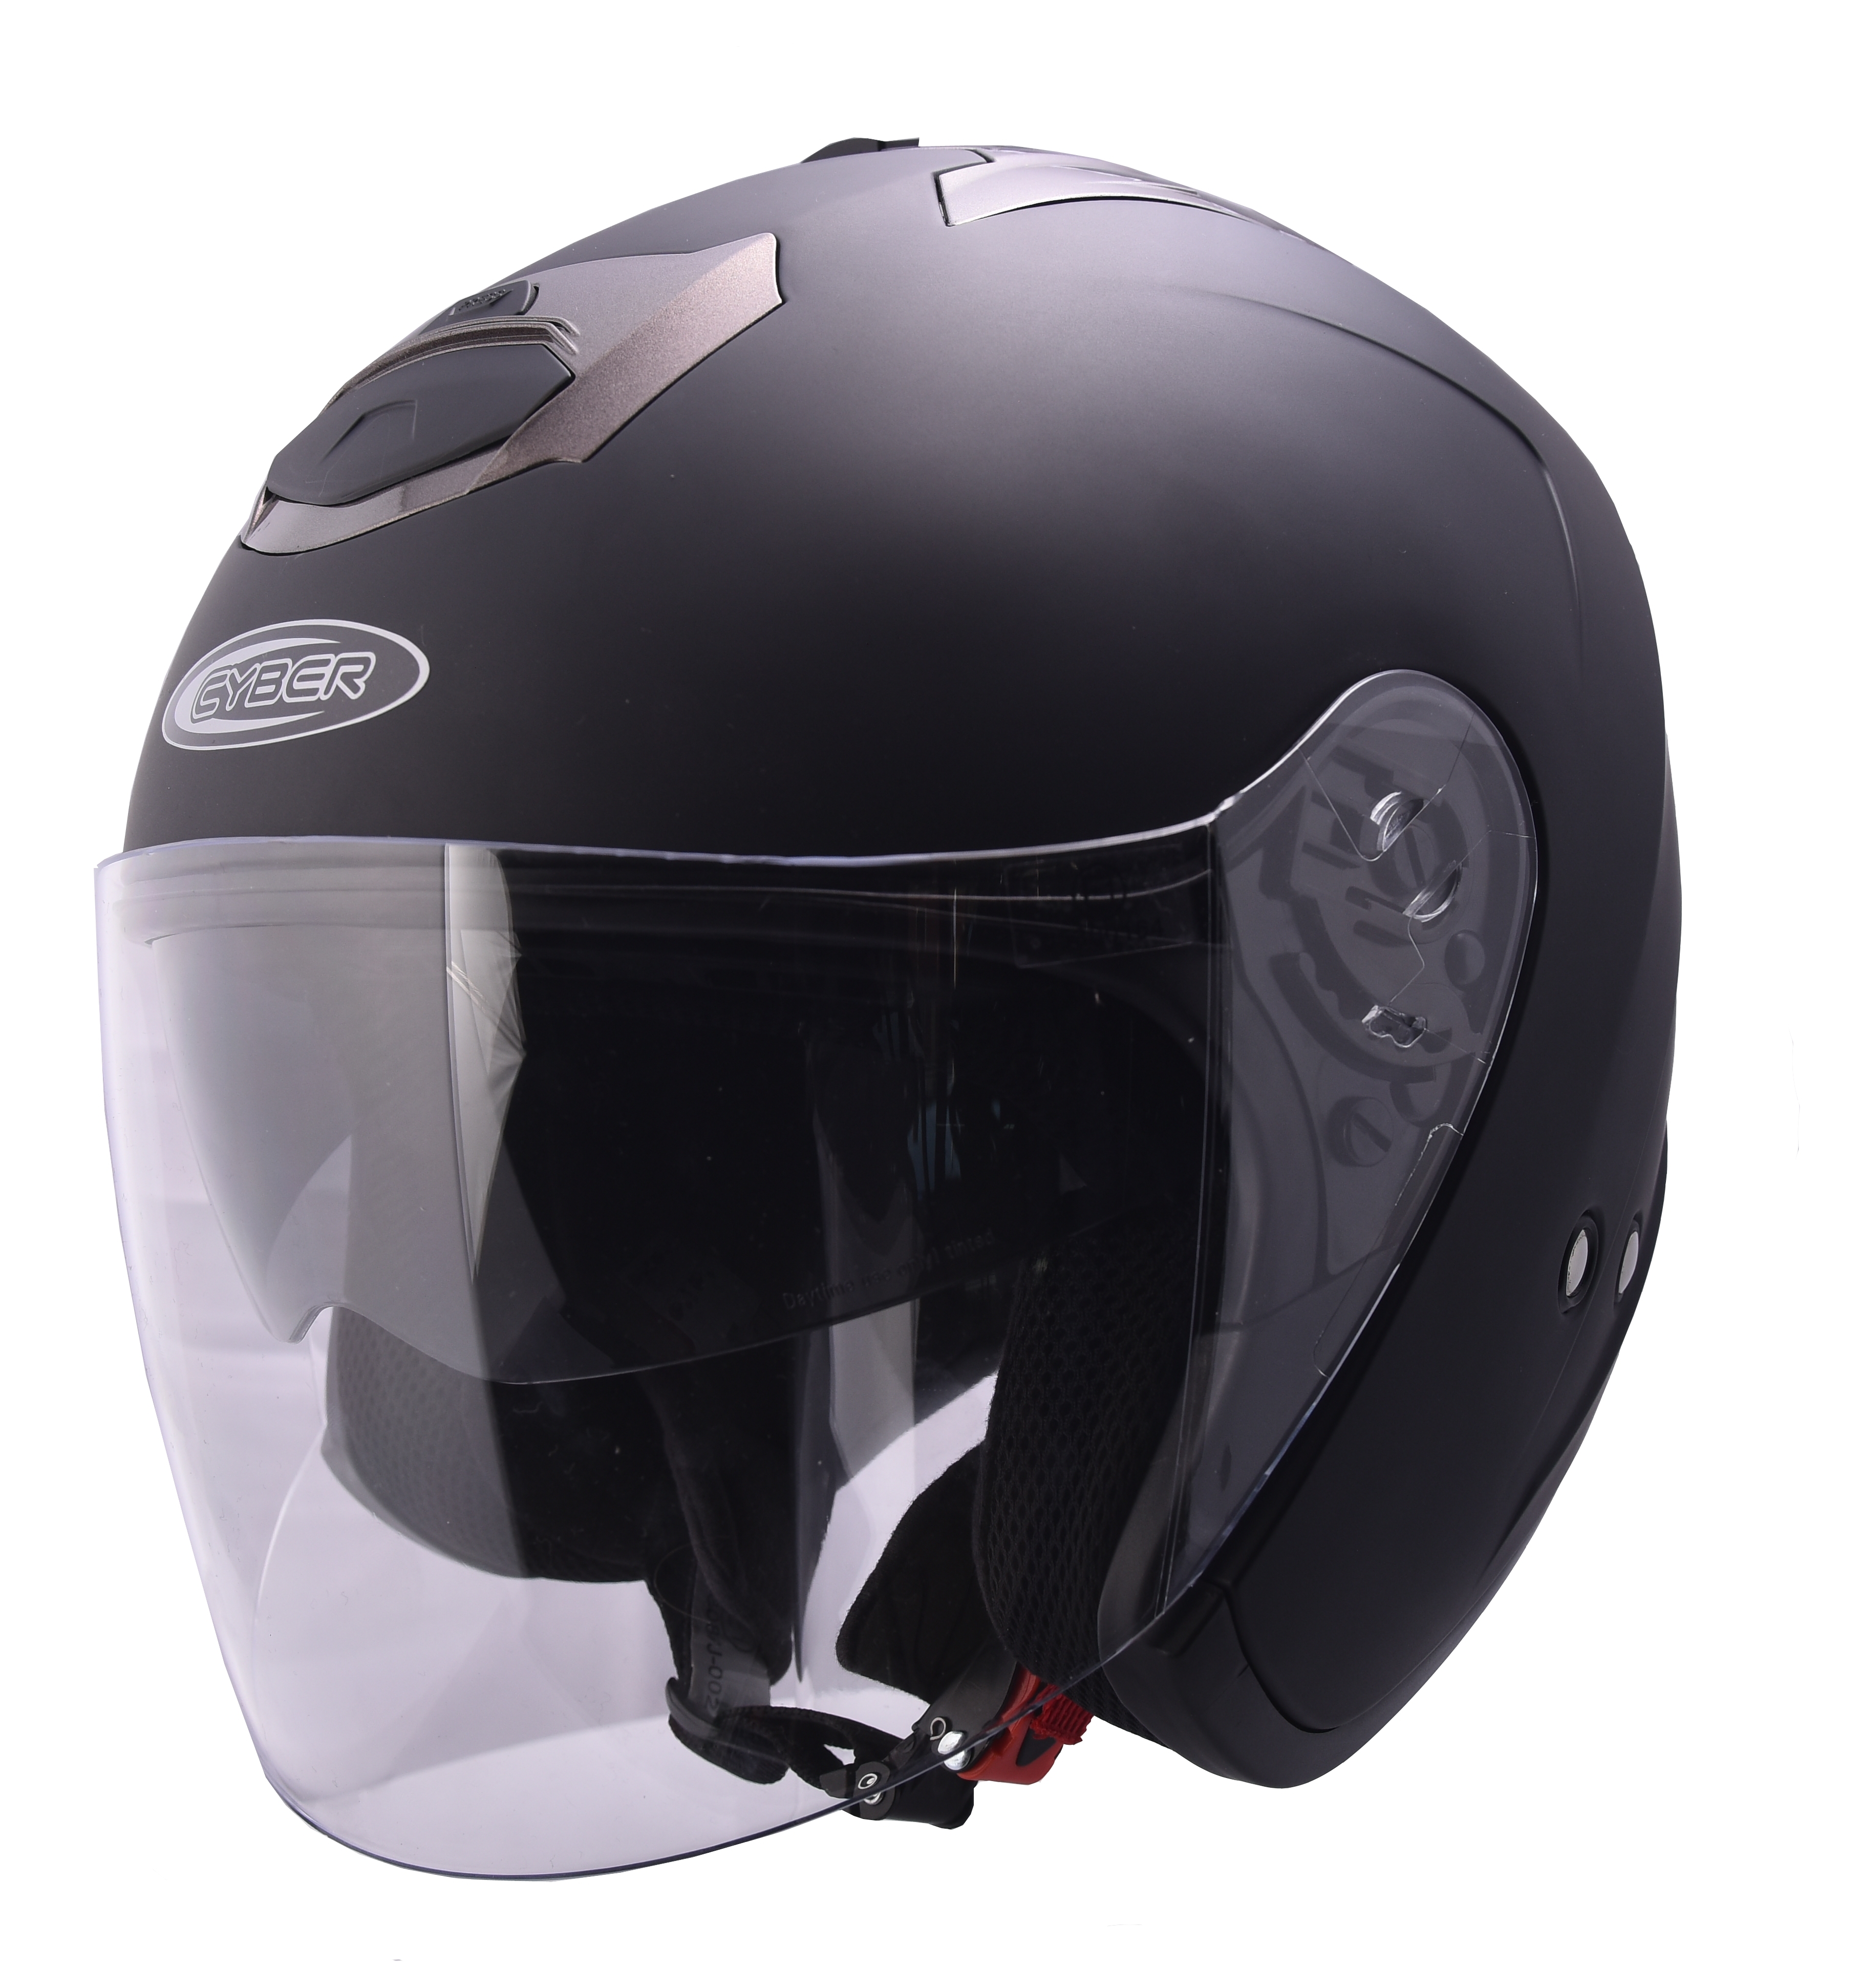 Moto helma Cyber U-386, černá matná